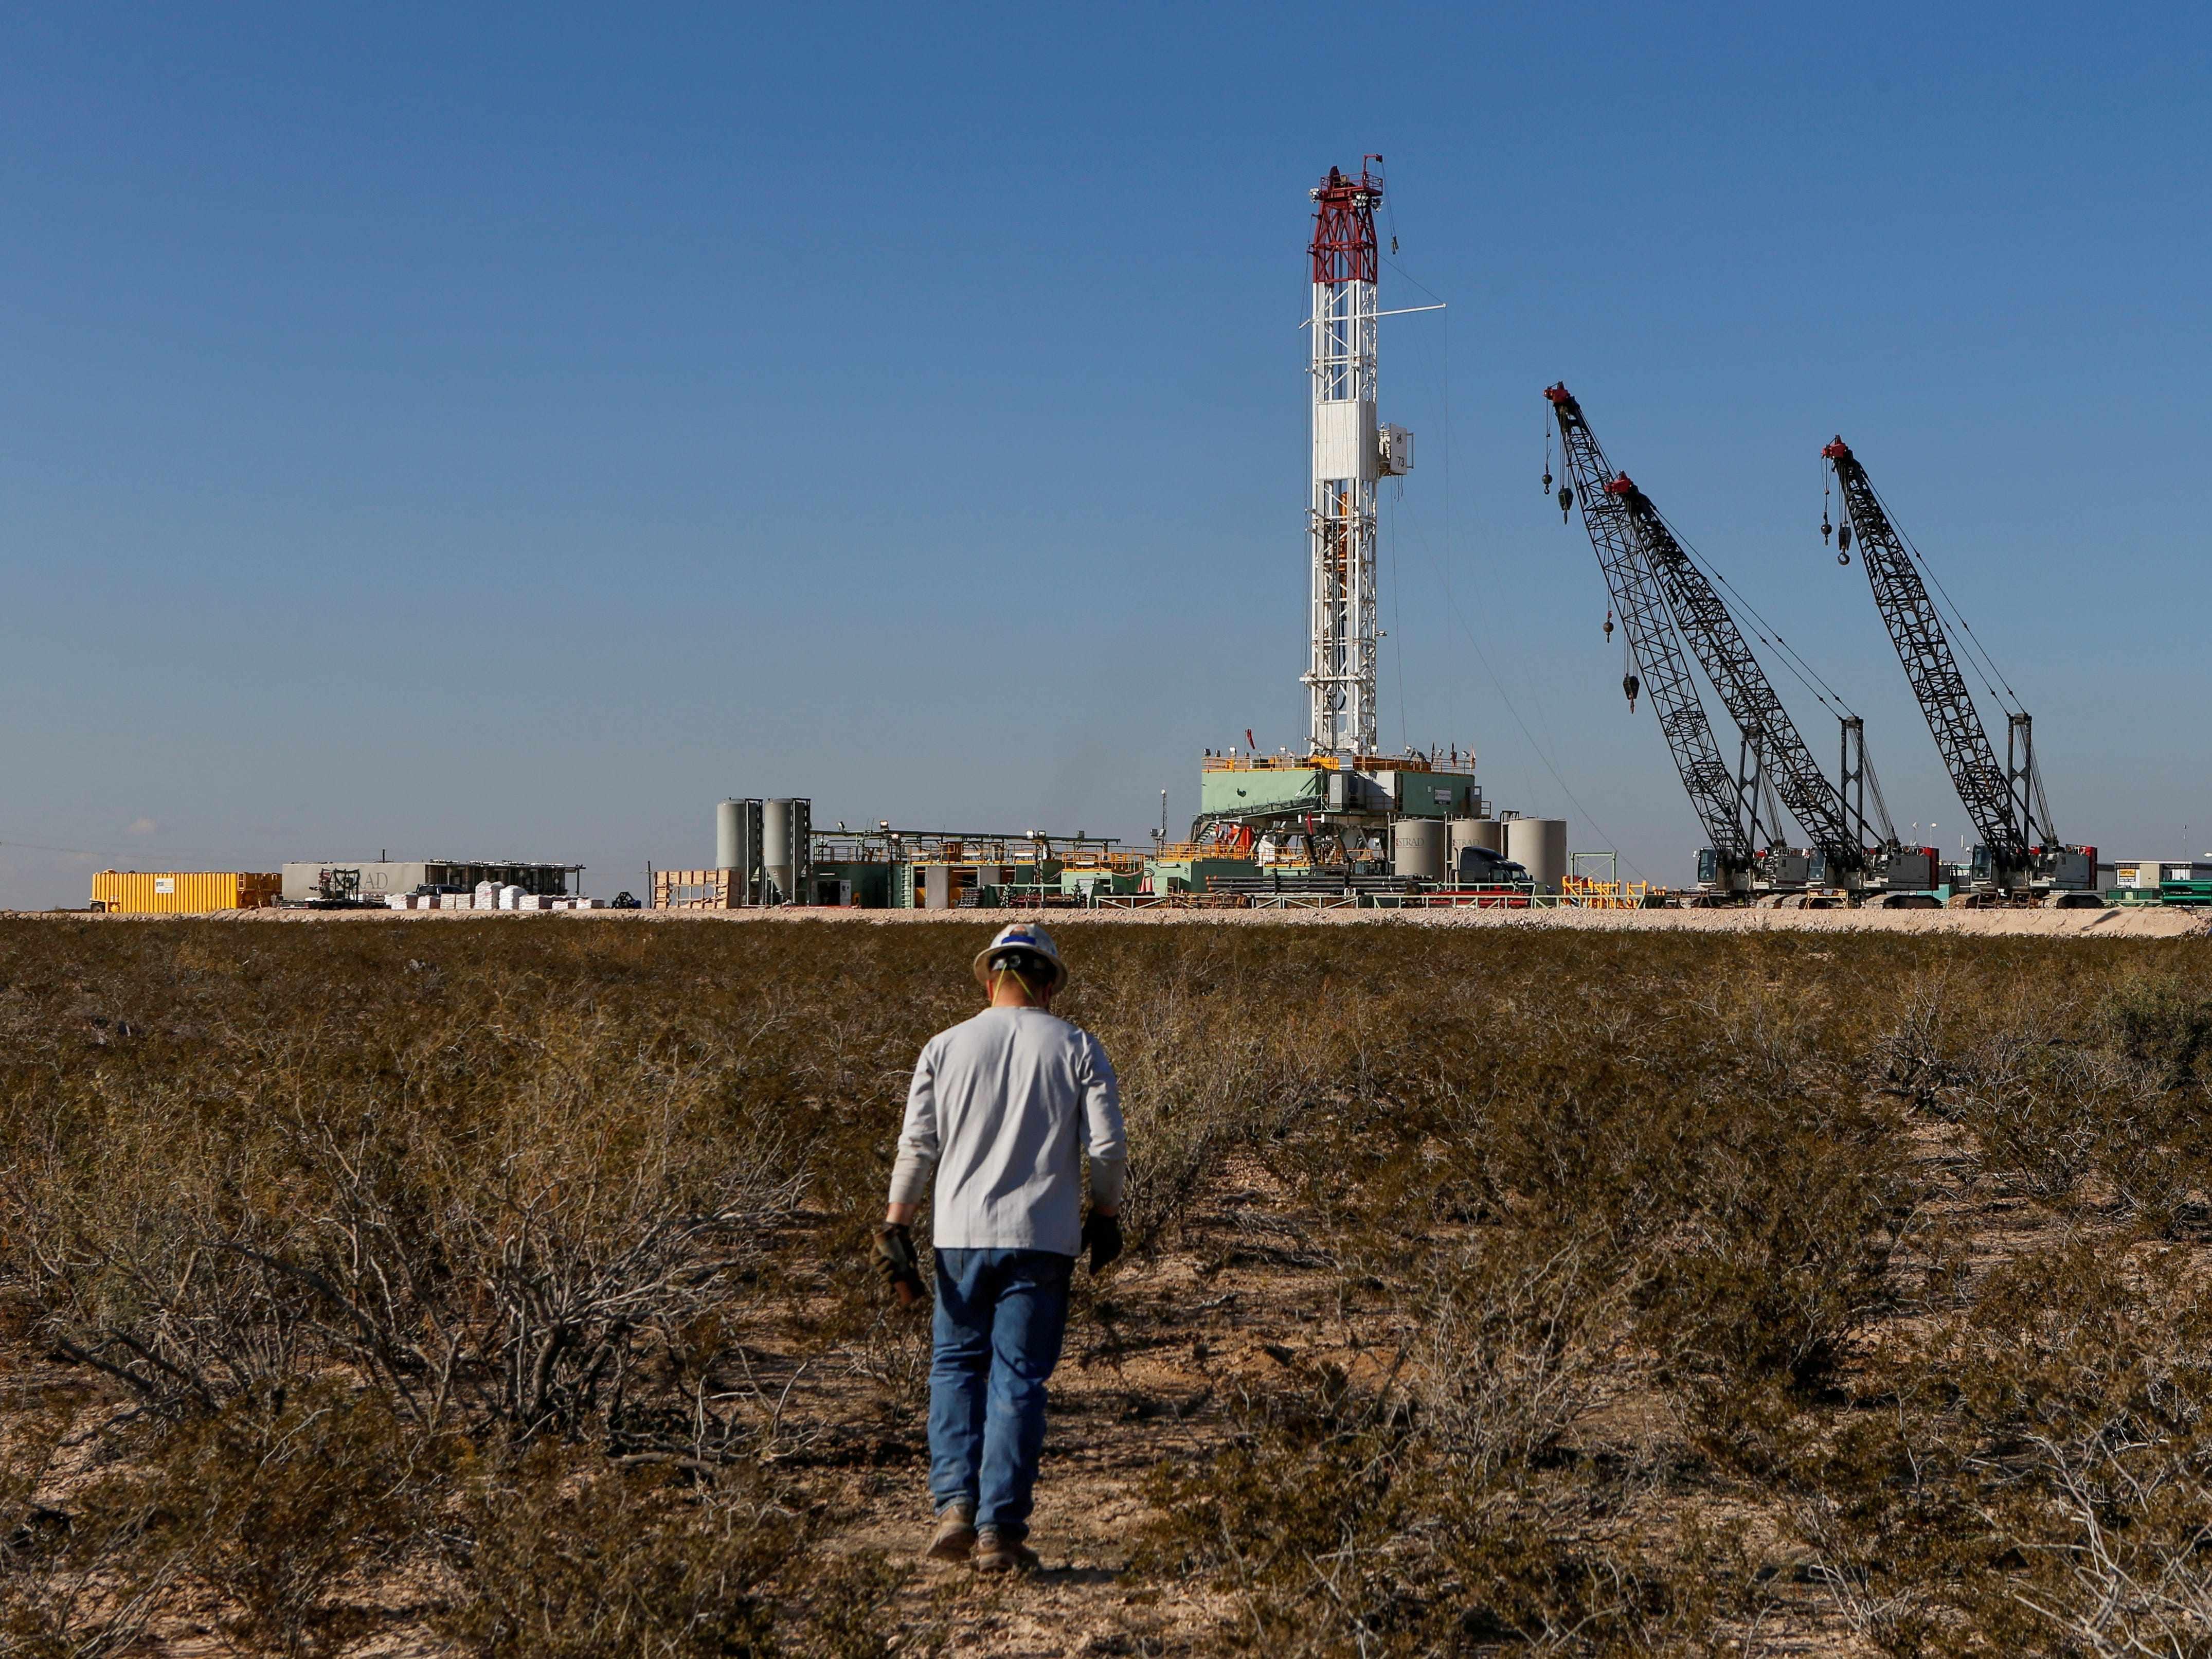 saudi-arabia oil prices highs vaccines